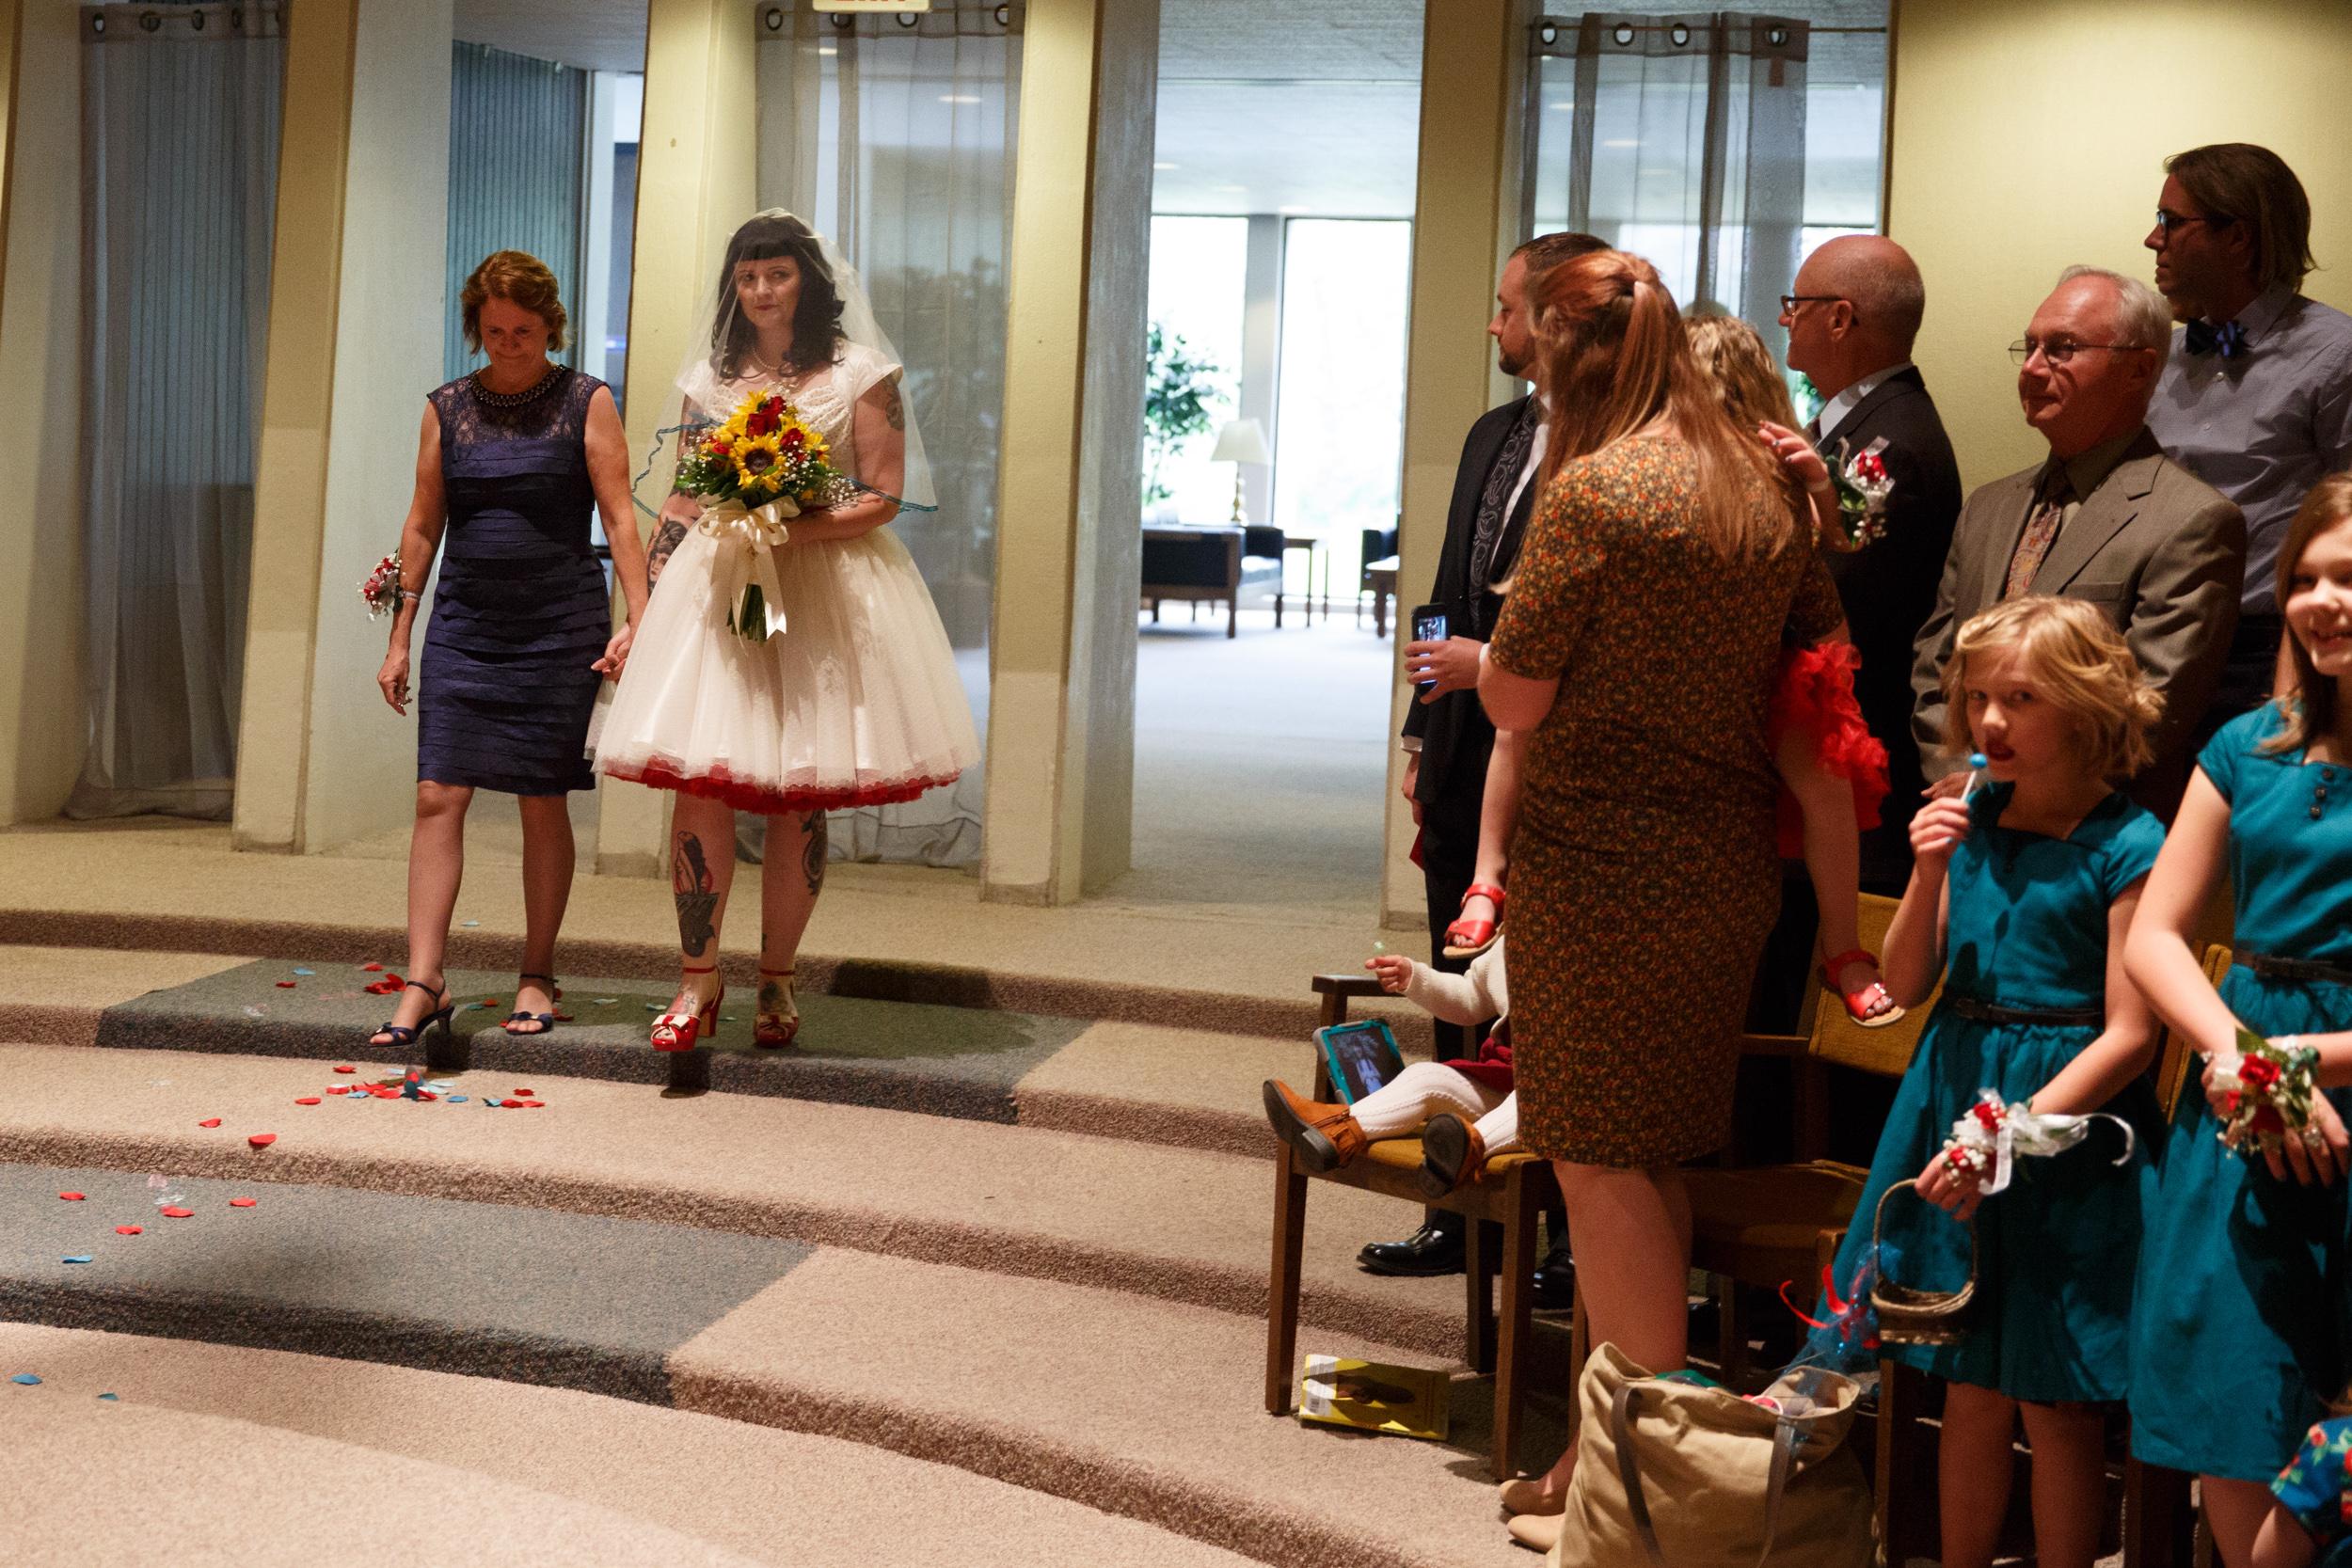 Christian & Sarah wedding photography by Brian milo-153.jpg